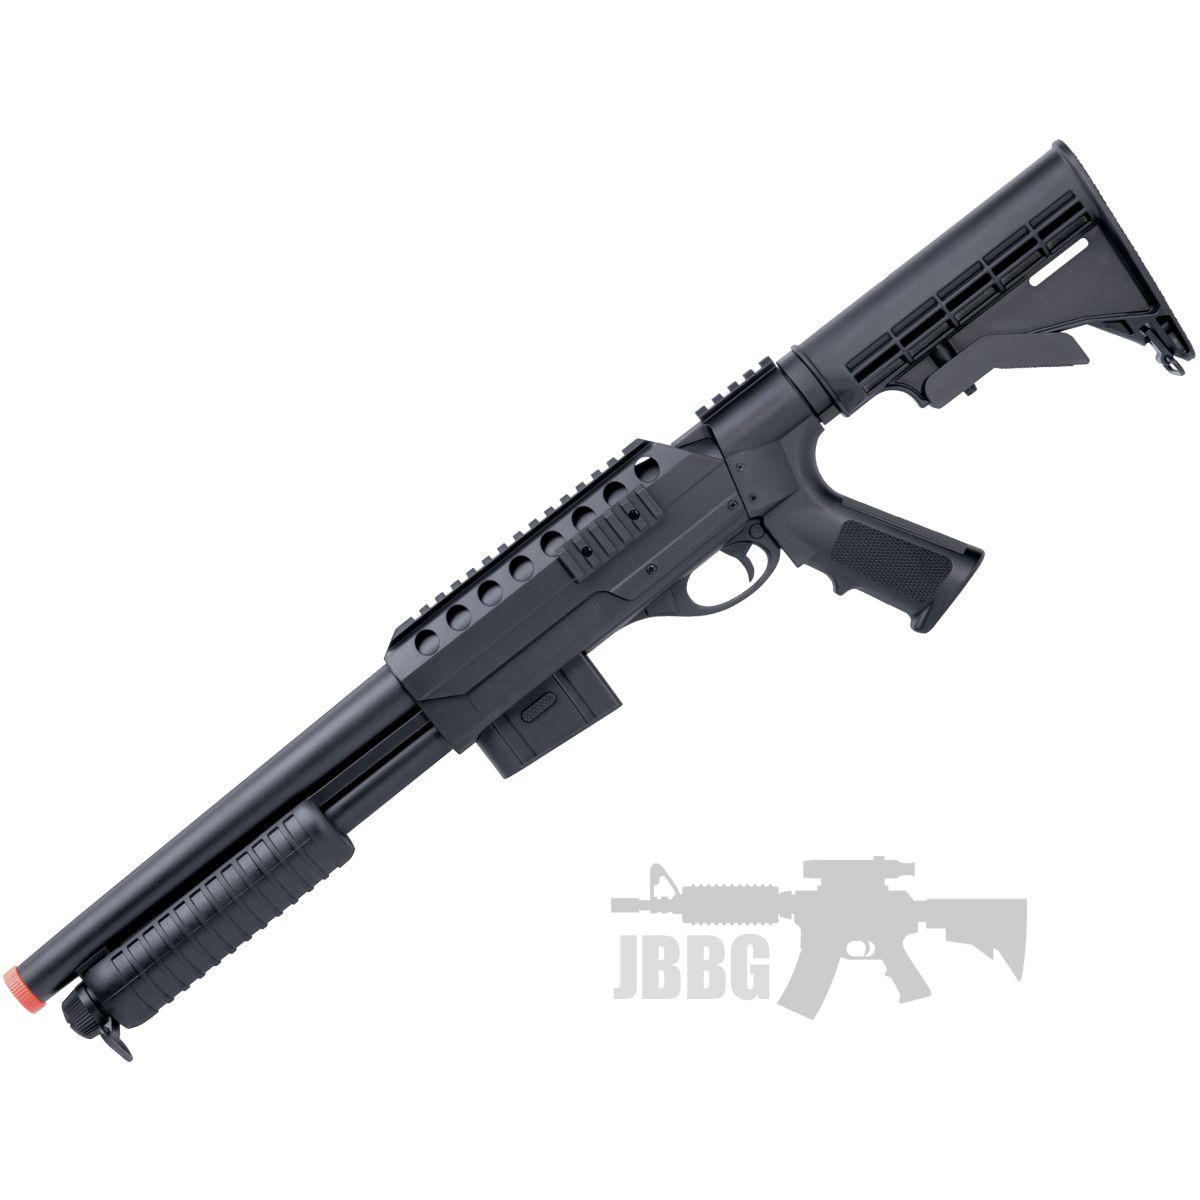 M47D1 Pump Action Spring Powered Airsoft Shotgun